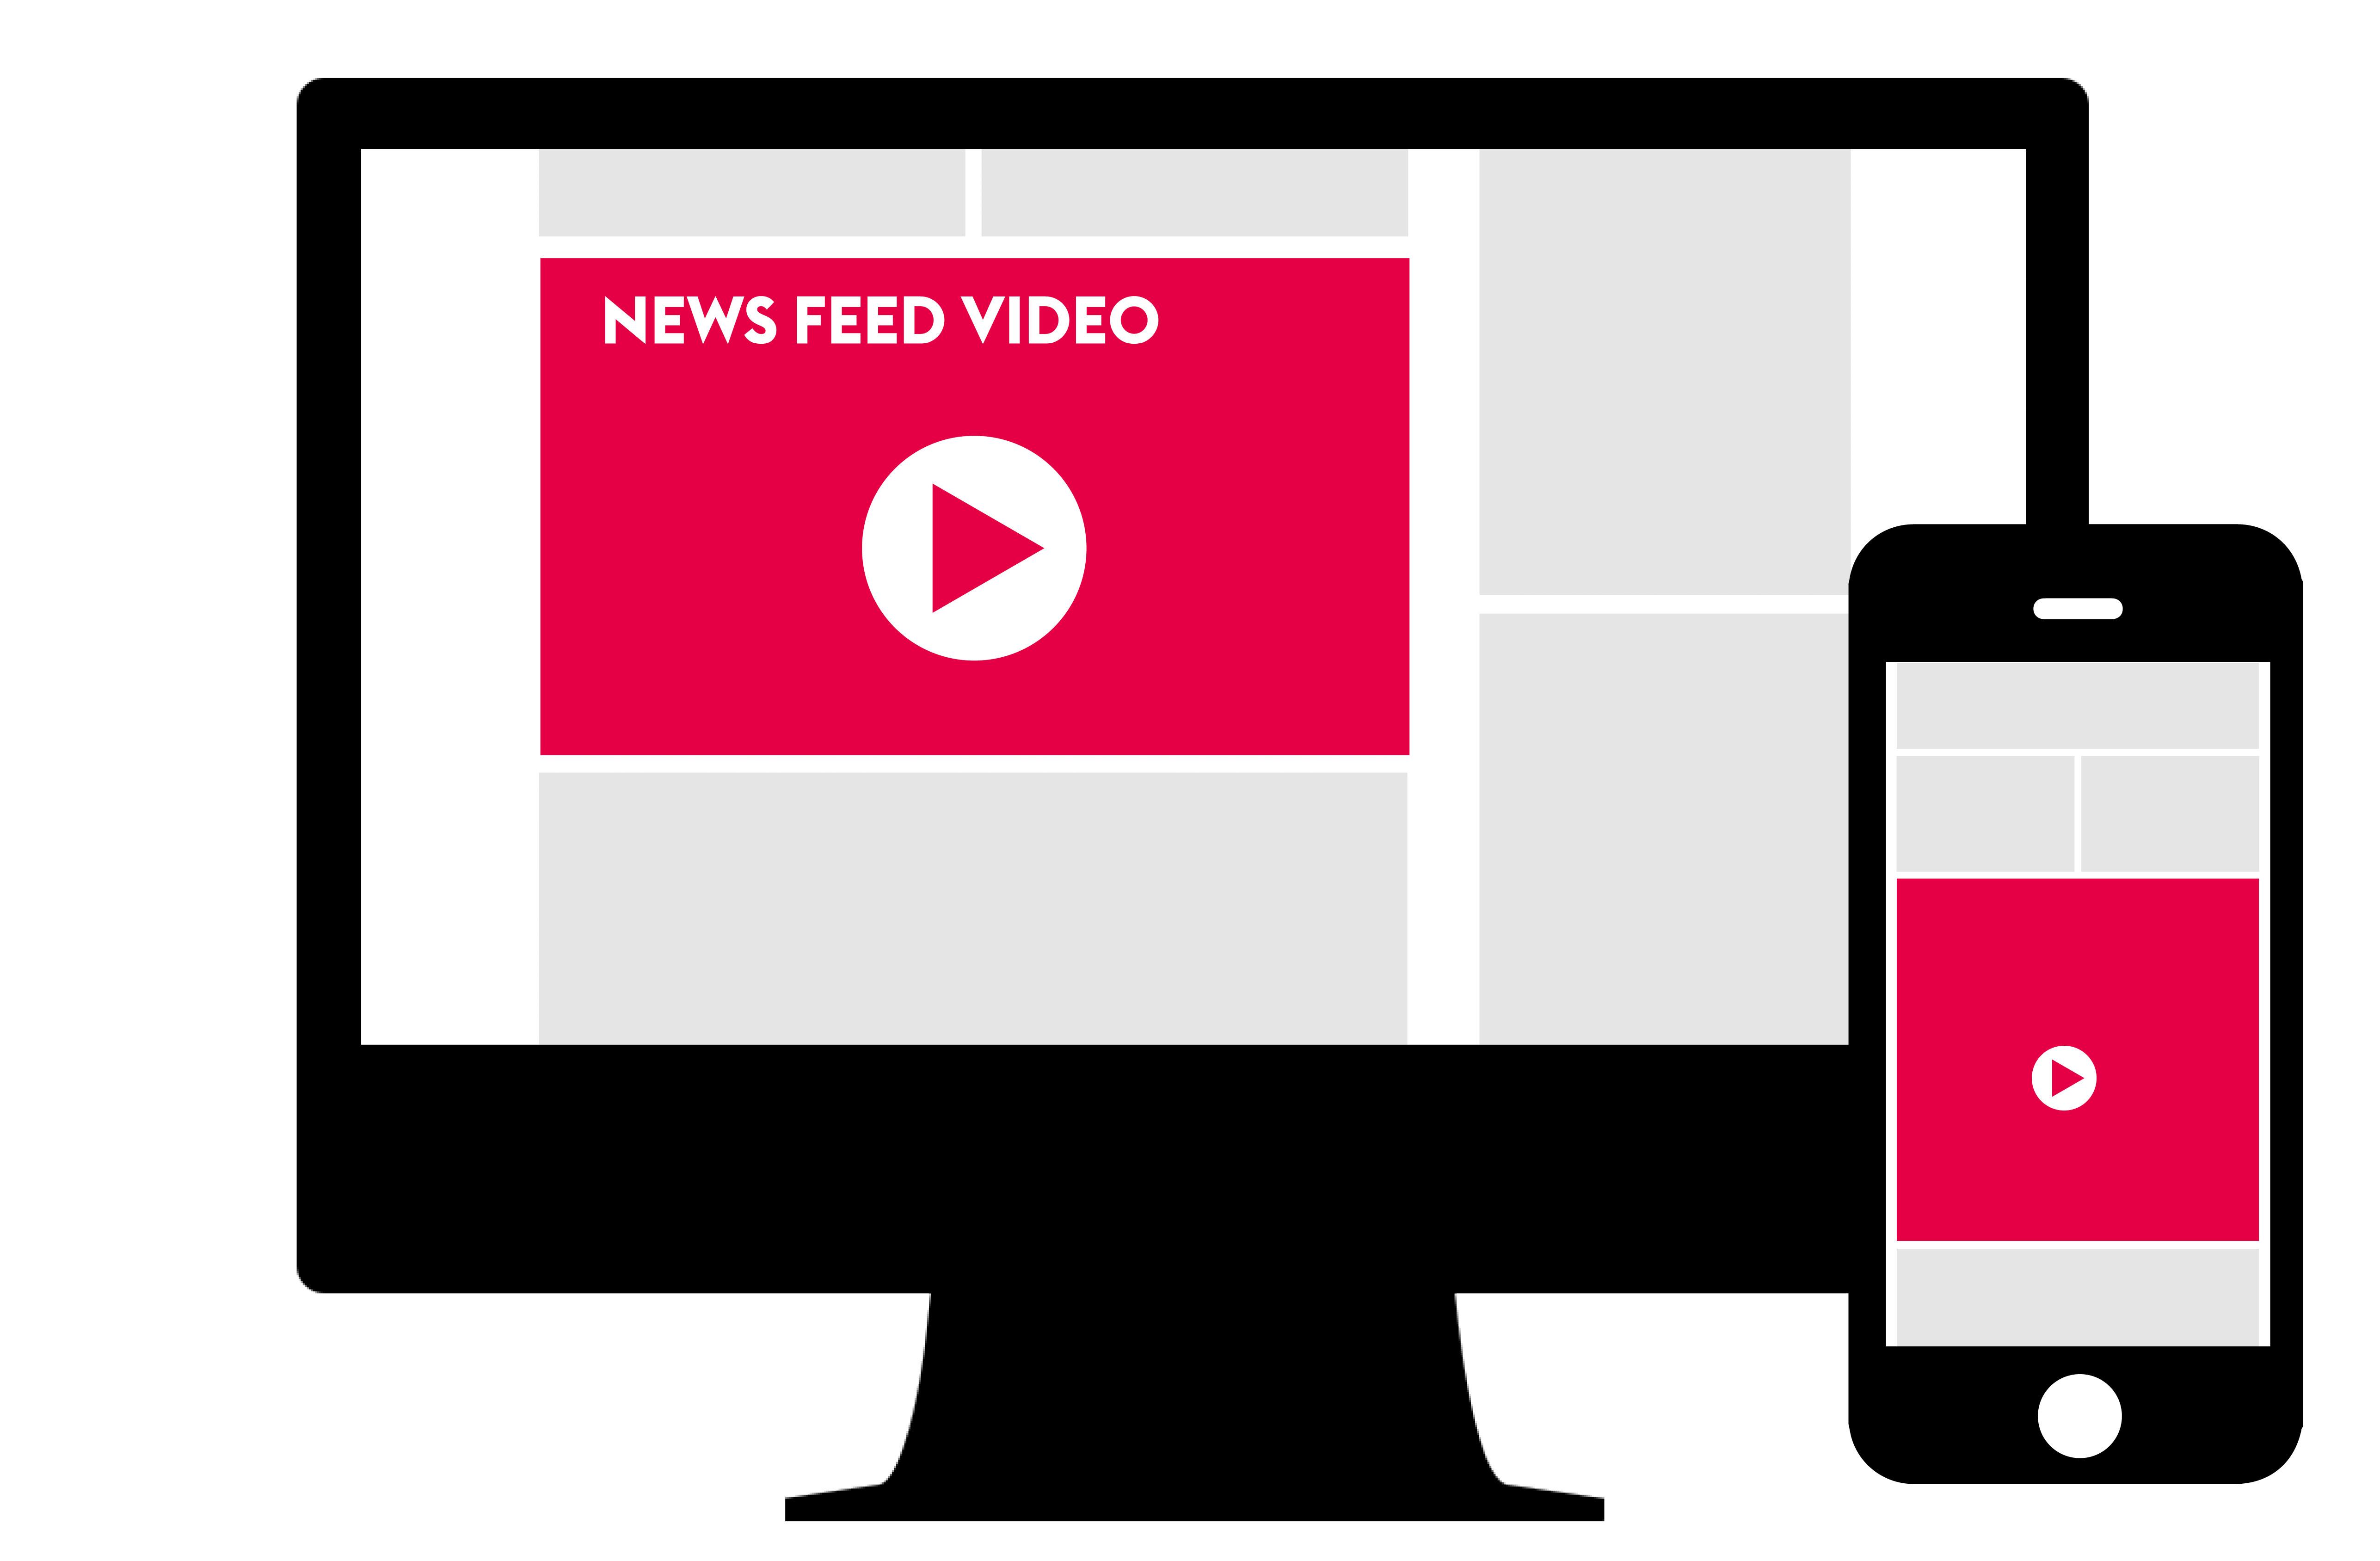 NEWS FEED VIDEO